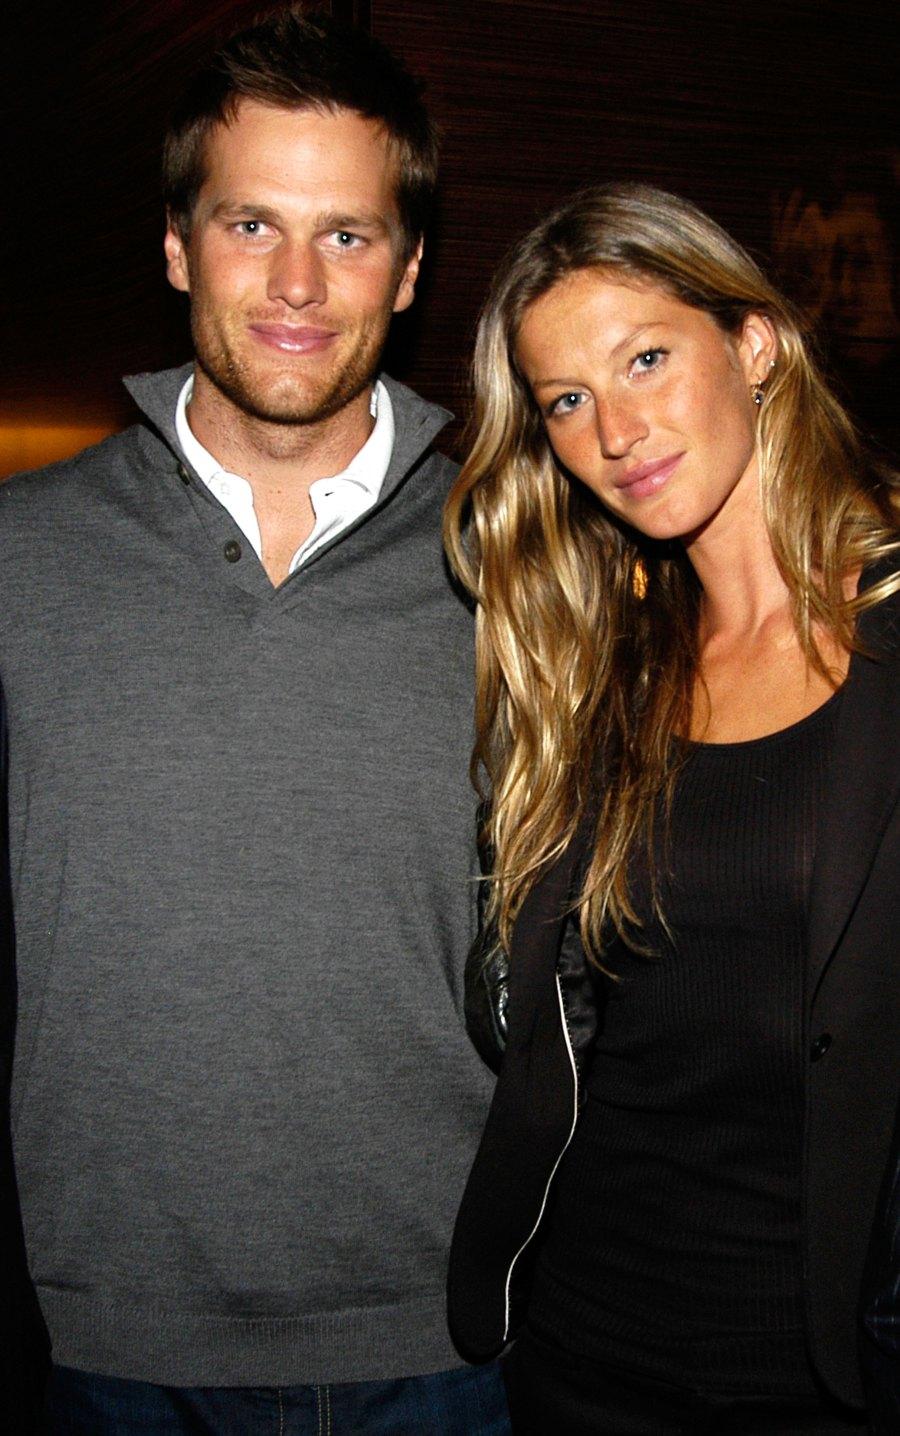 Tom Brady and Gisele Bundchen's Most Romantic Quotes